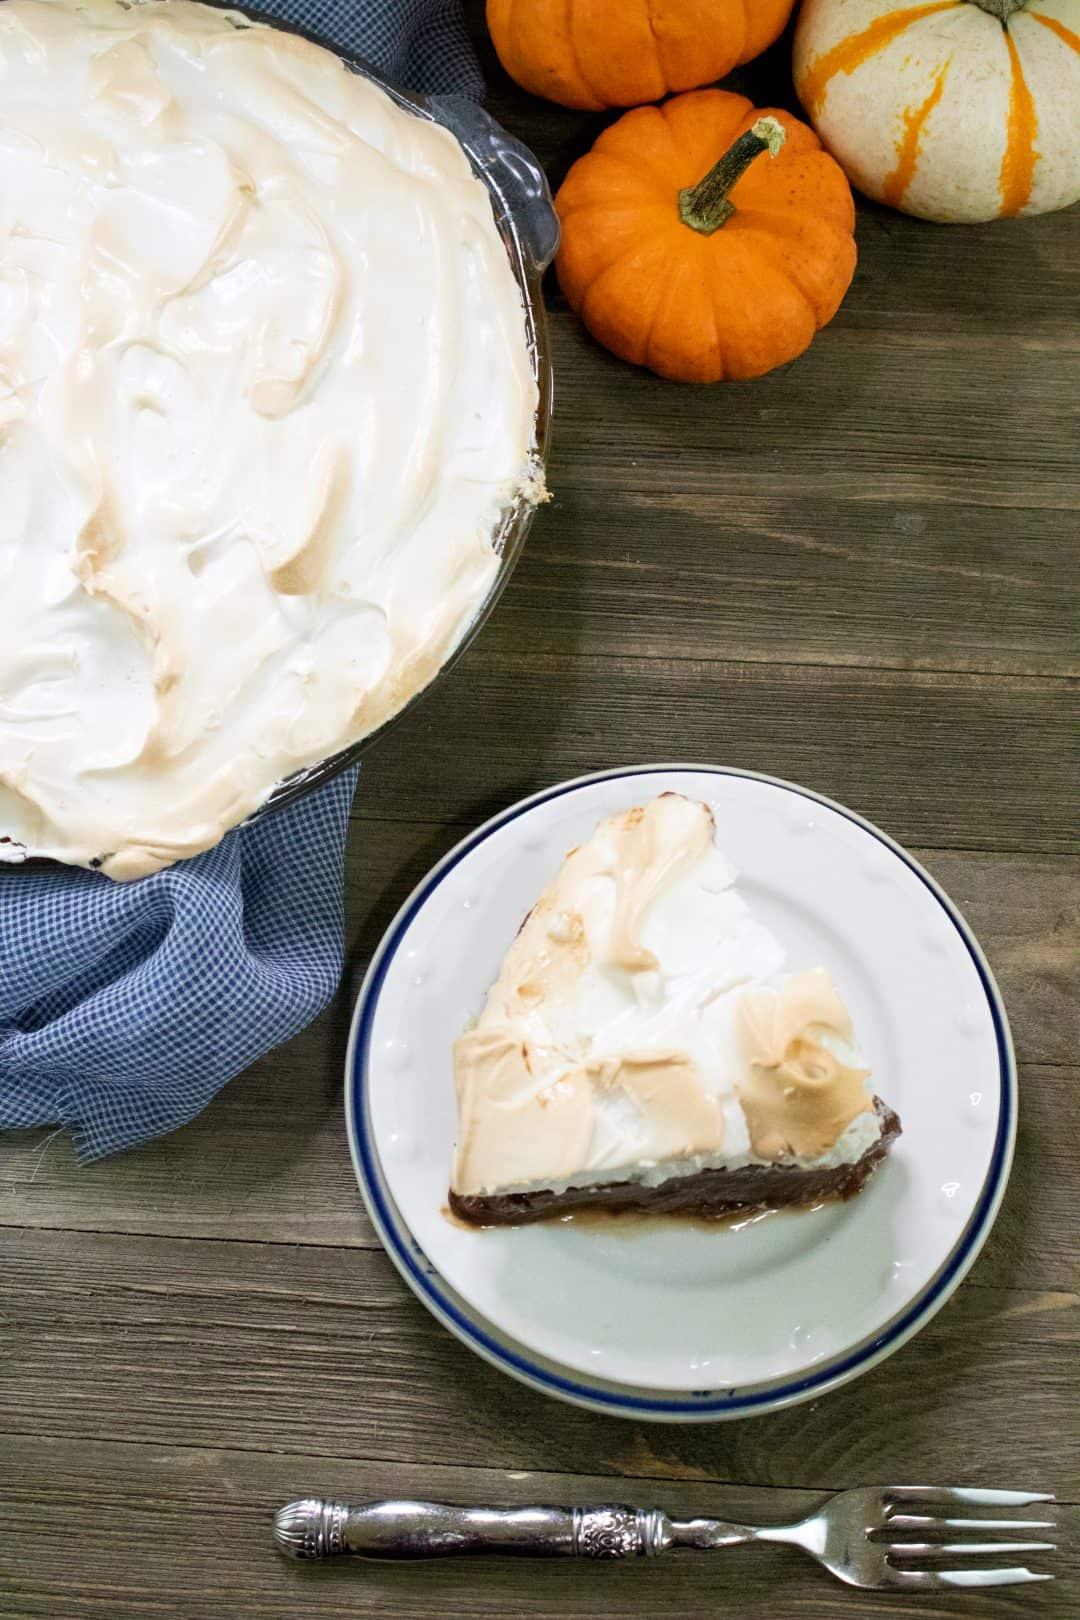 Chocolate Pie Recipe with Meringue